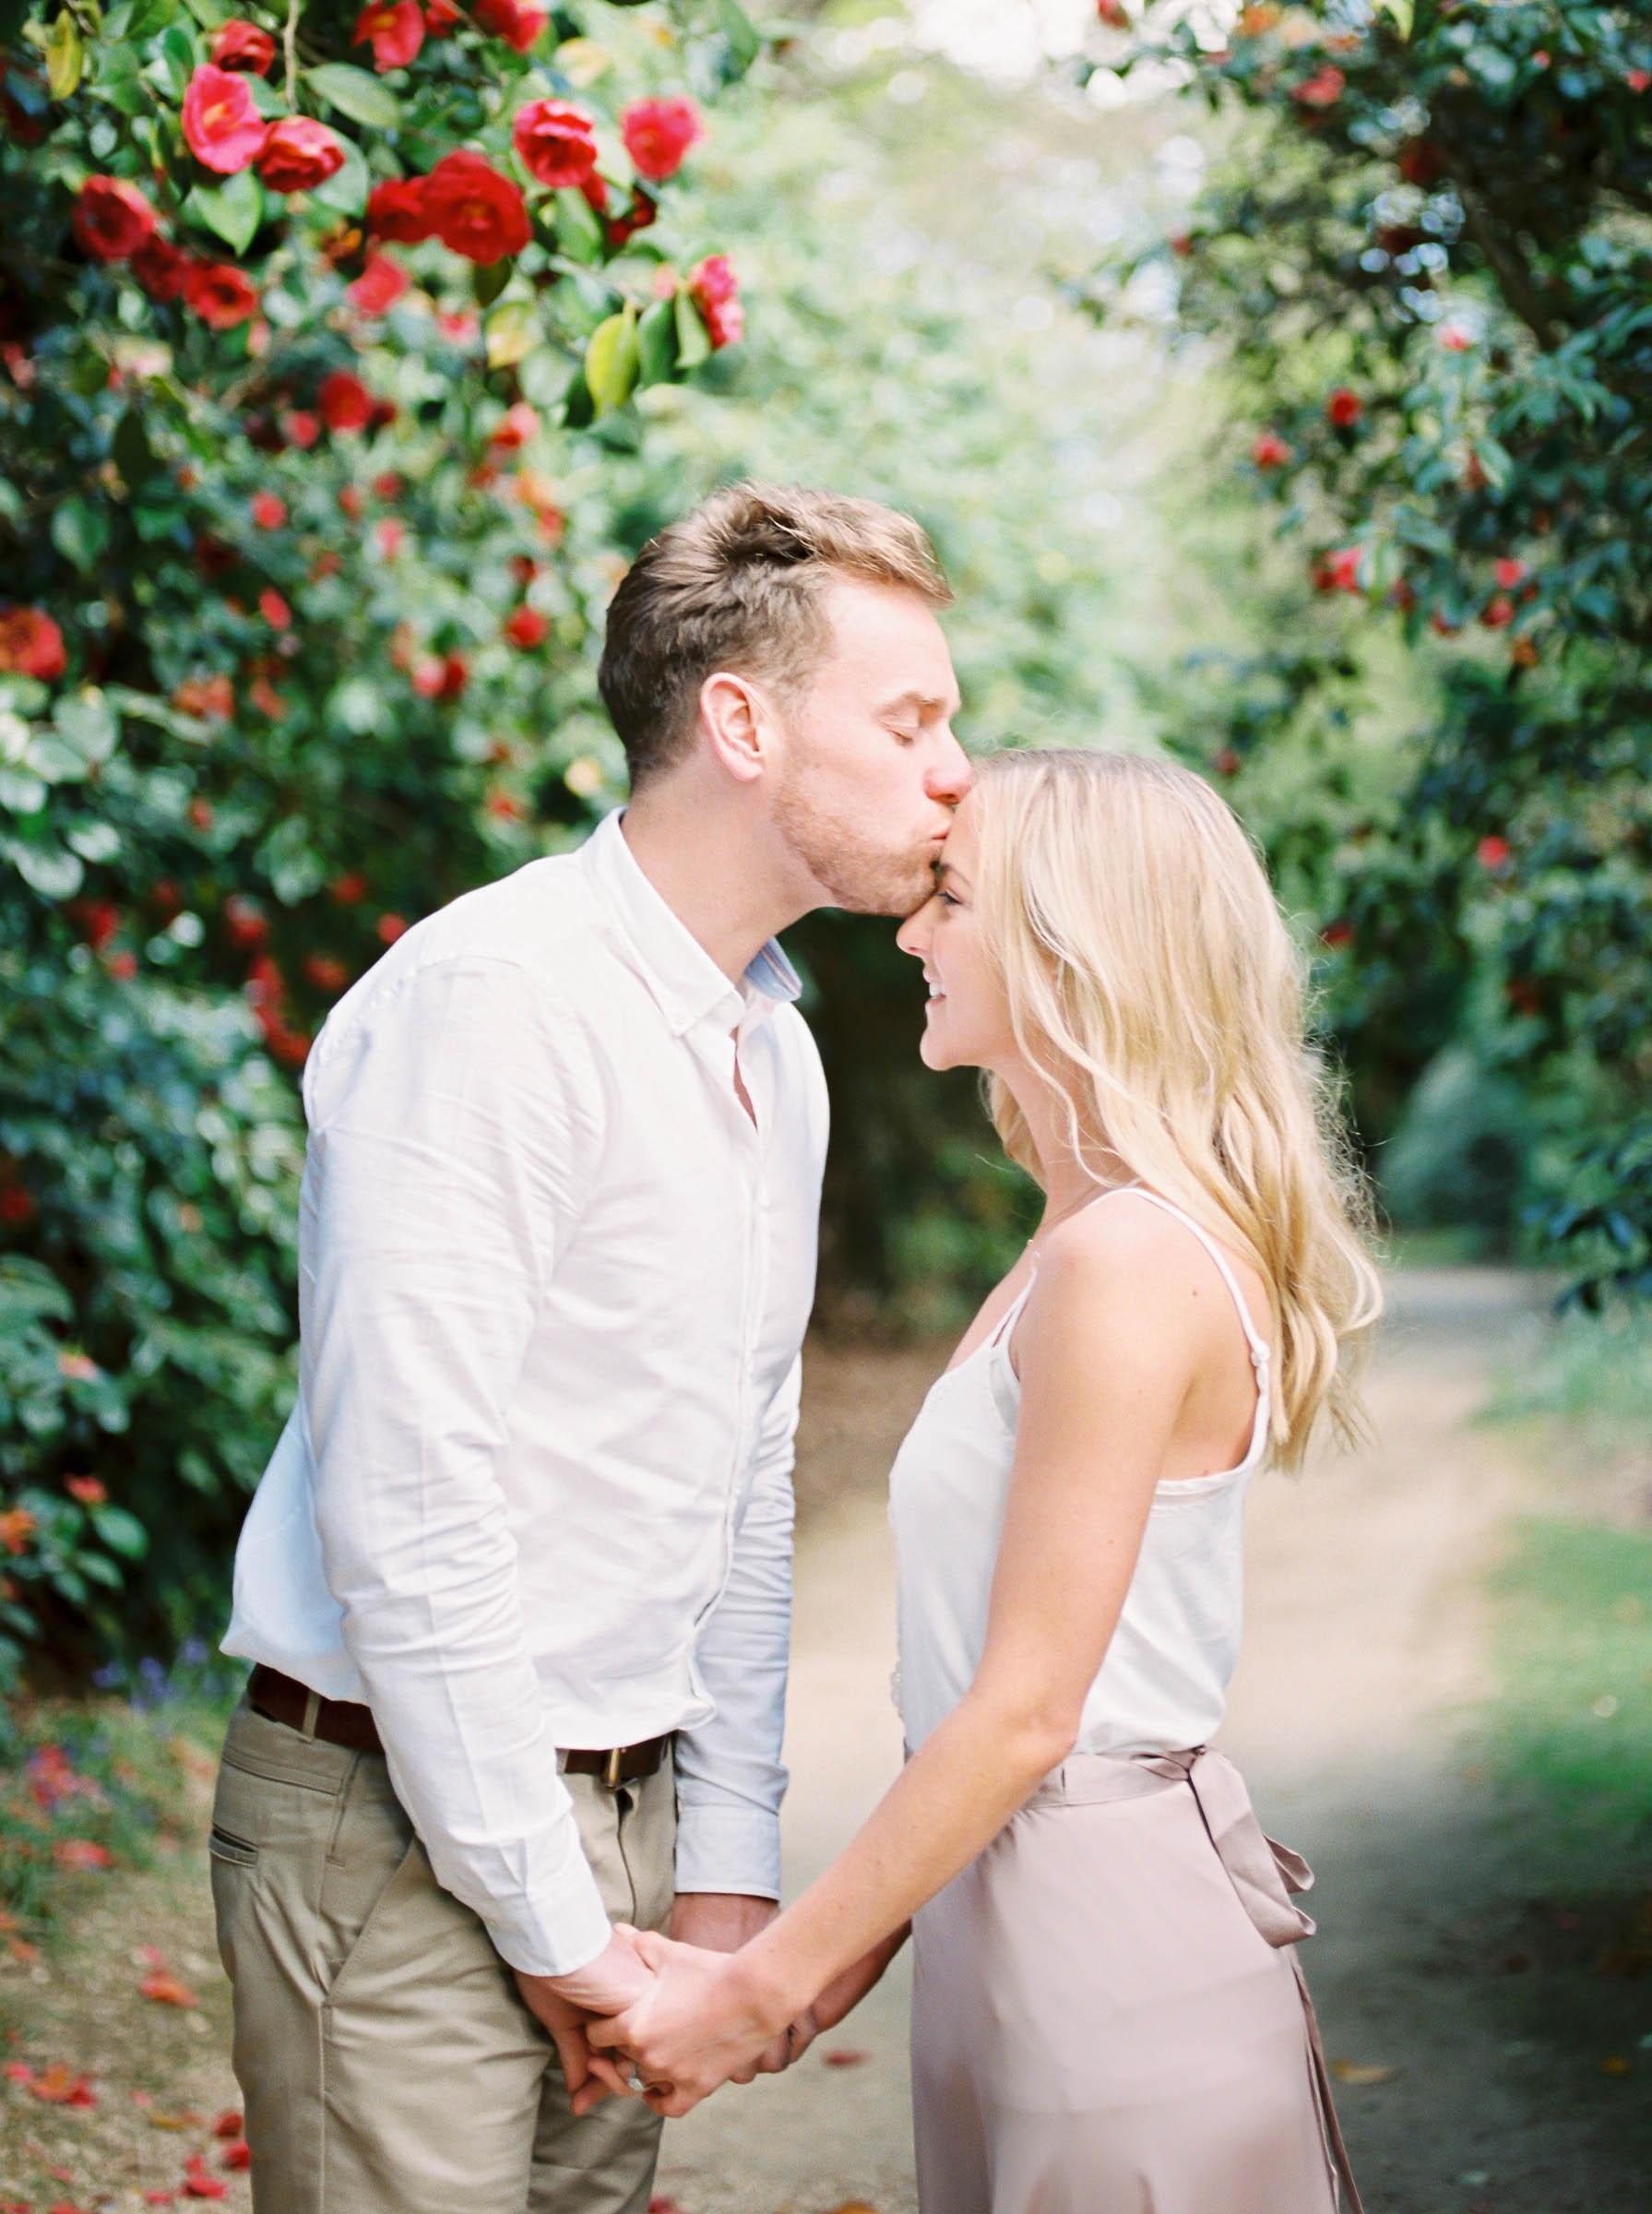 Amy O'Boyle Photography- Destination & UK Fine Art Film Wedding Photographer- Sheffield Park Garden National Trust Spring Engagement Shoot-2.jpg